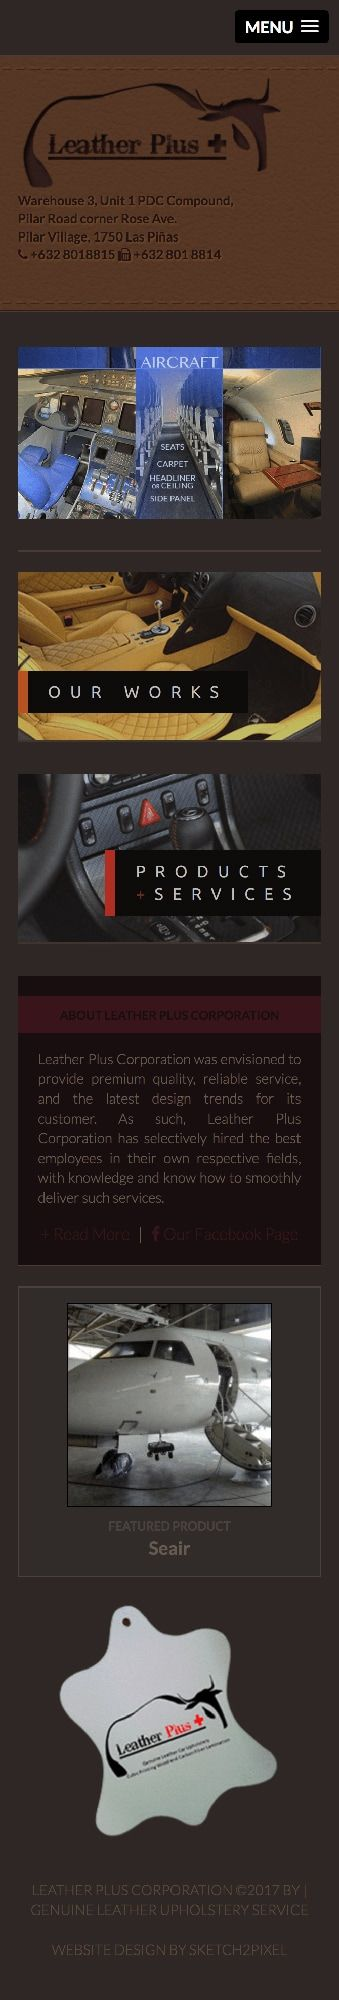 brochure company website mobile